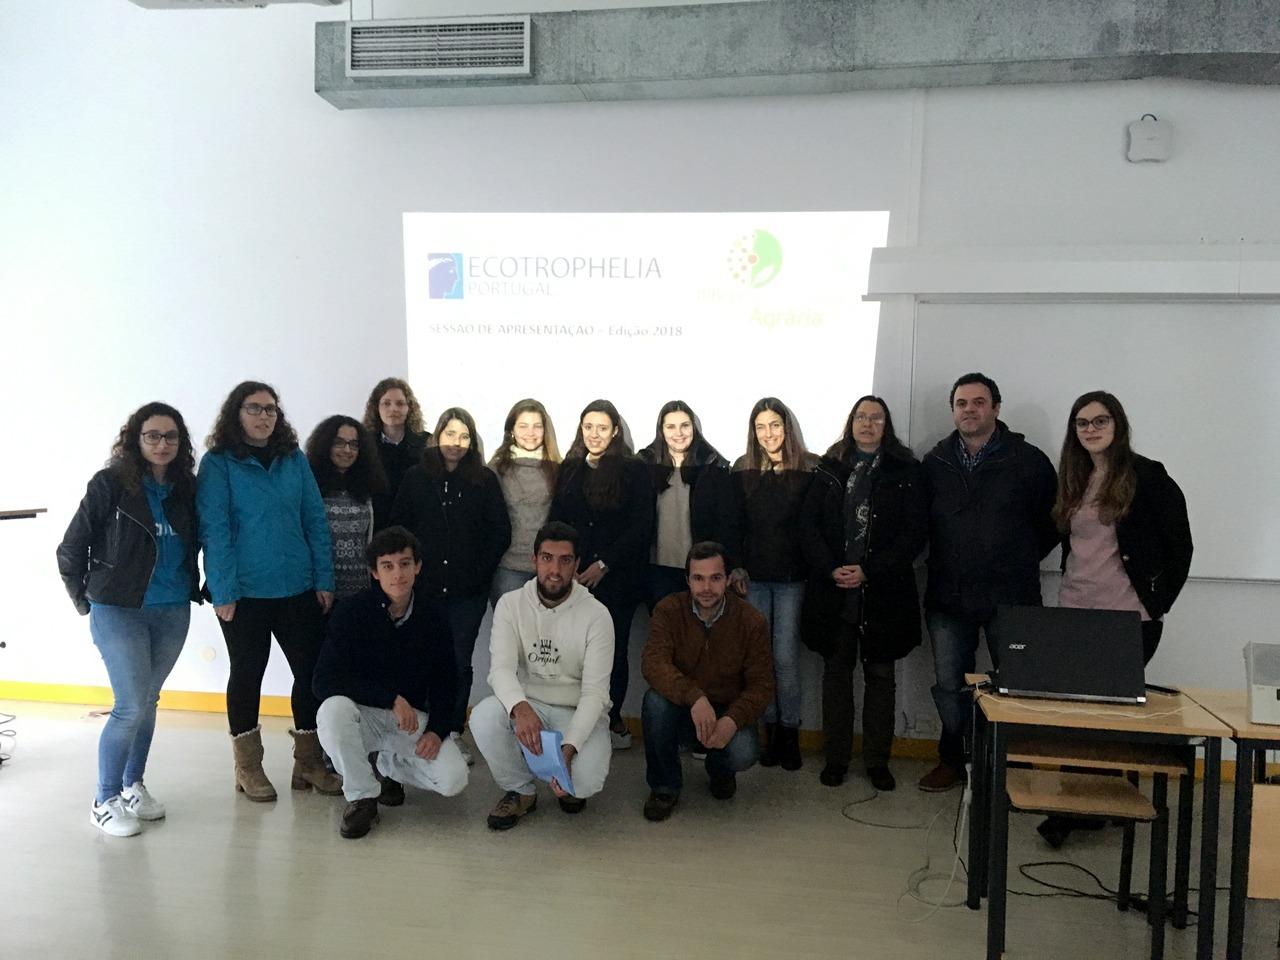 Ecotrophelia Portugal, Media, Press Release, Candidaturas ao prémio ECOTROPHELIA Portugal 2018 encerram sexta-feira